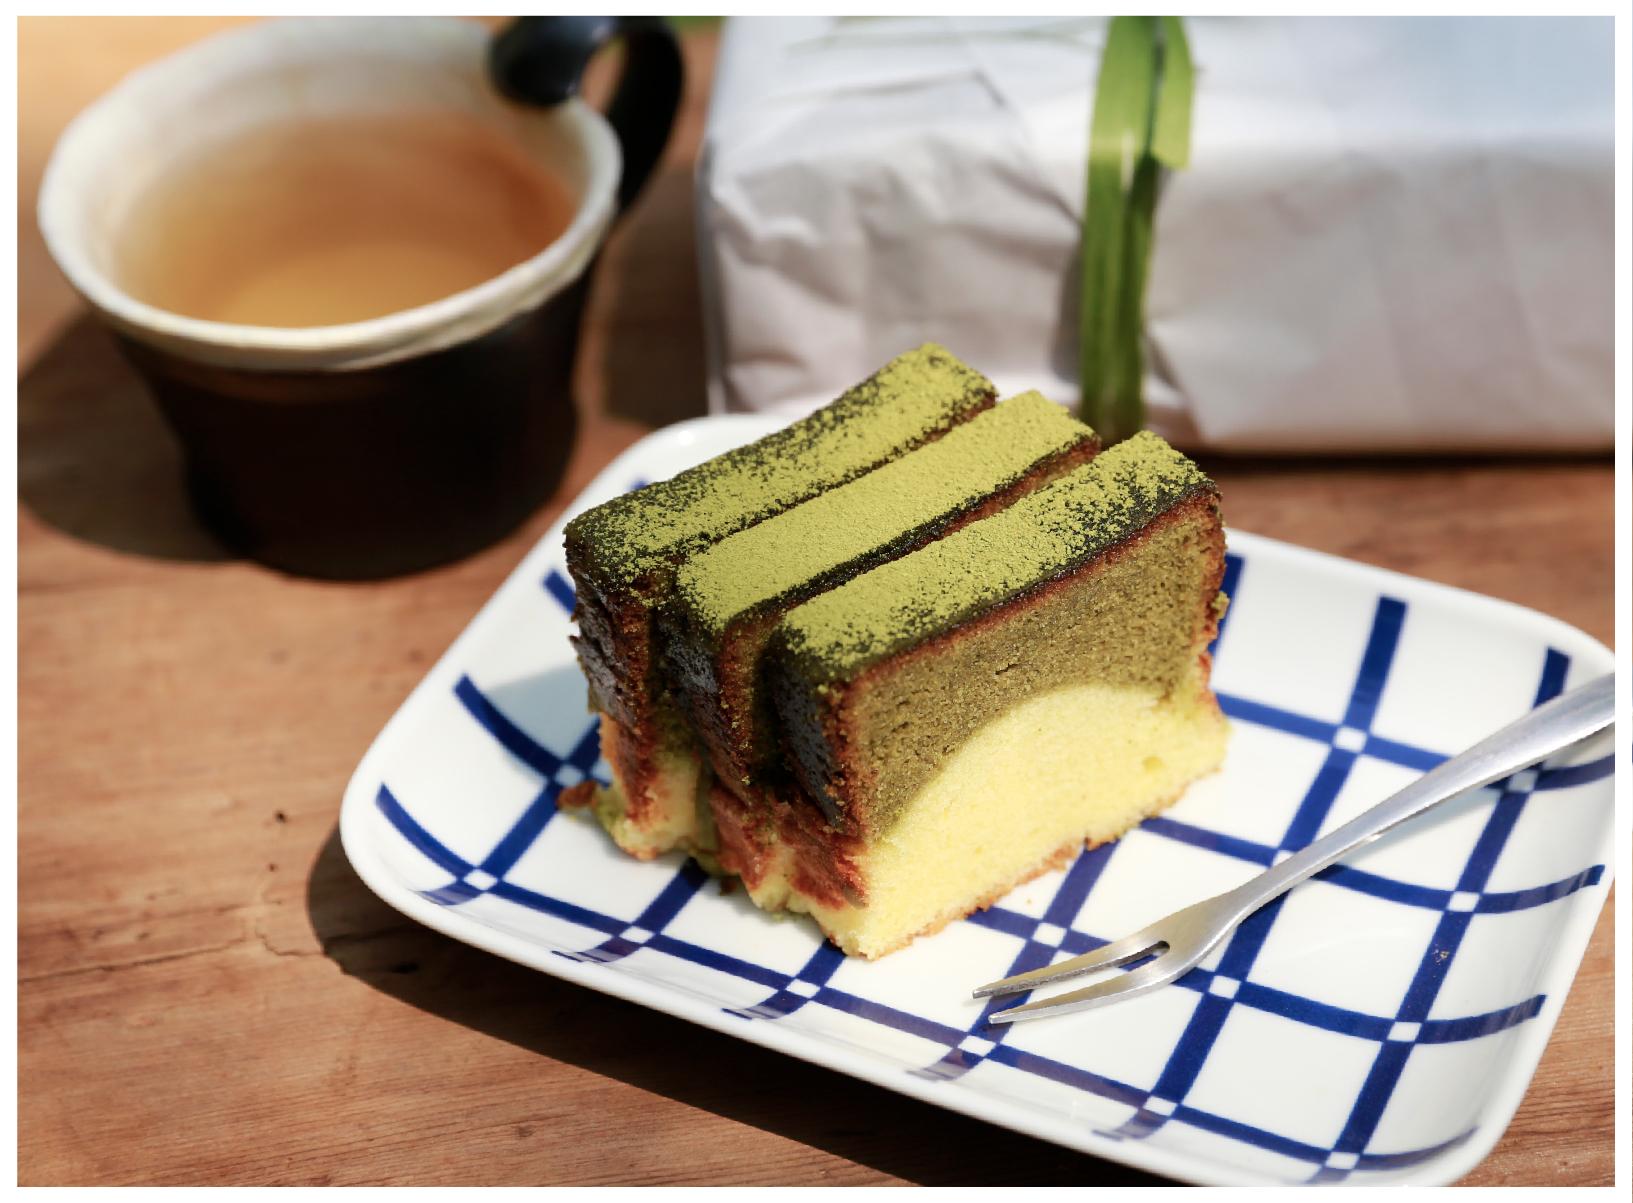 Taste the unique fragrance of Sanxia's Biluochun Tea in handmade pound cake | Made of naturally non-GMO soybeans from Taiwan | KOUJI Restaurant